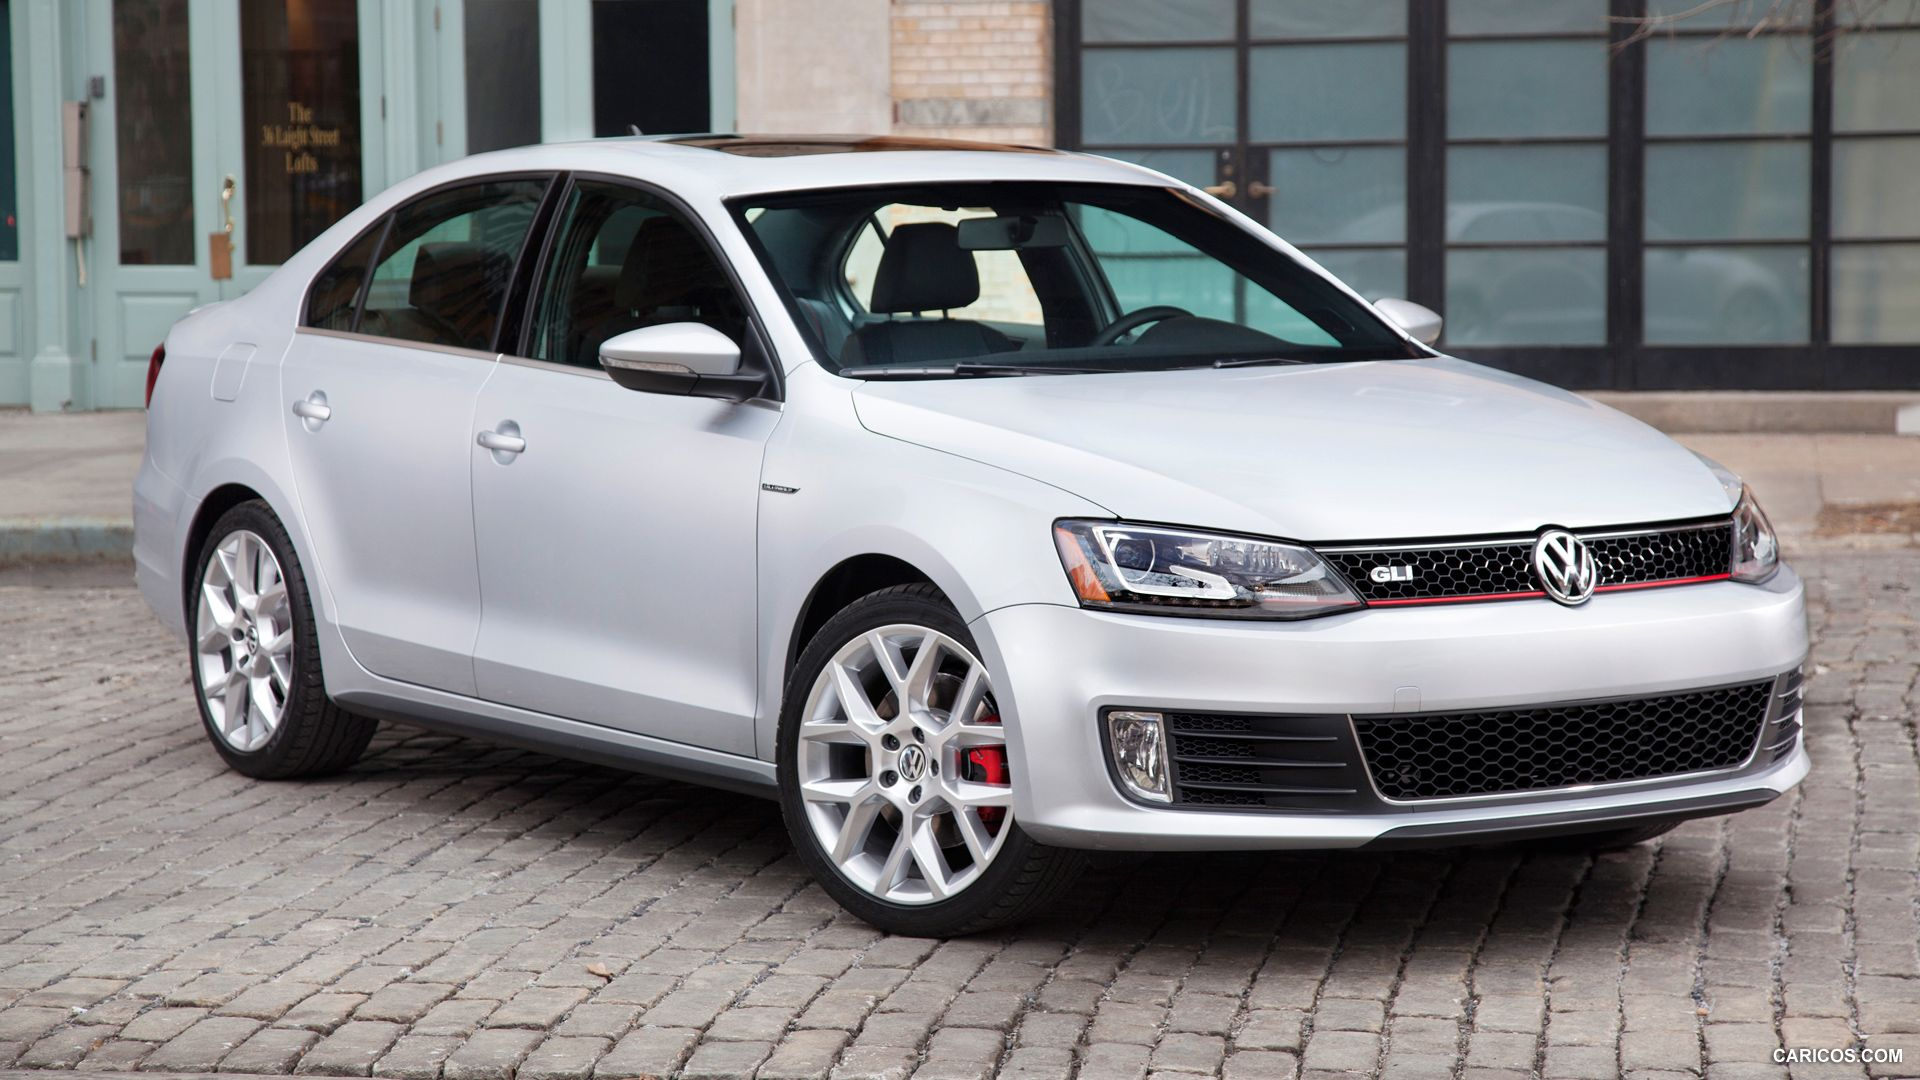 Volkswagen Jetta GLI Edition 30 | Cars | Pinterest | Jetta gli ...